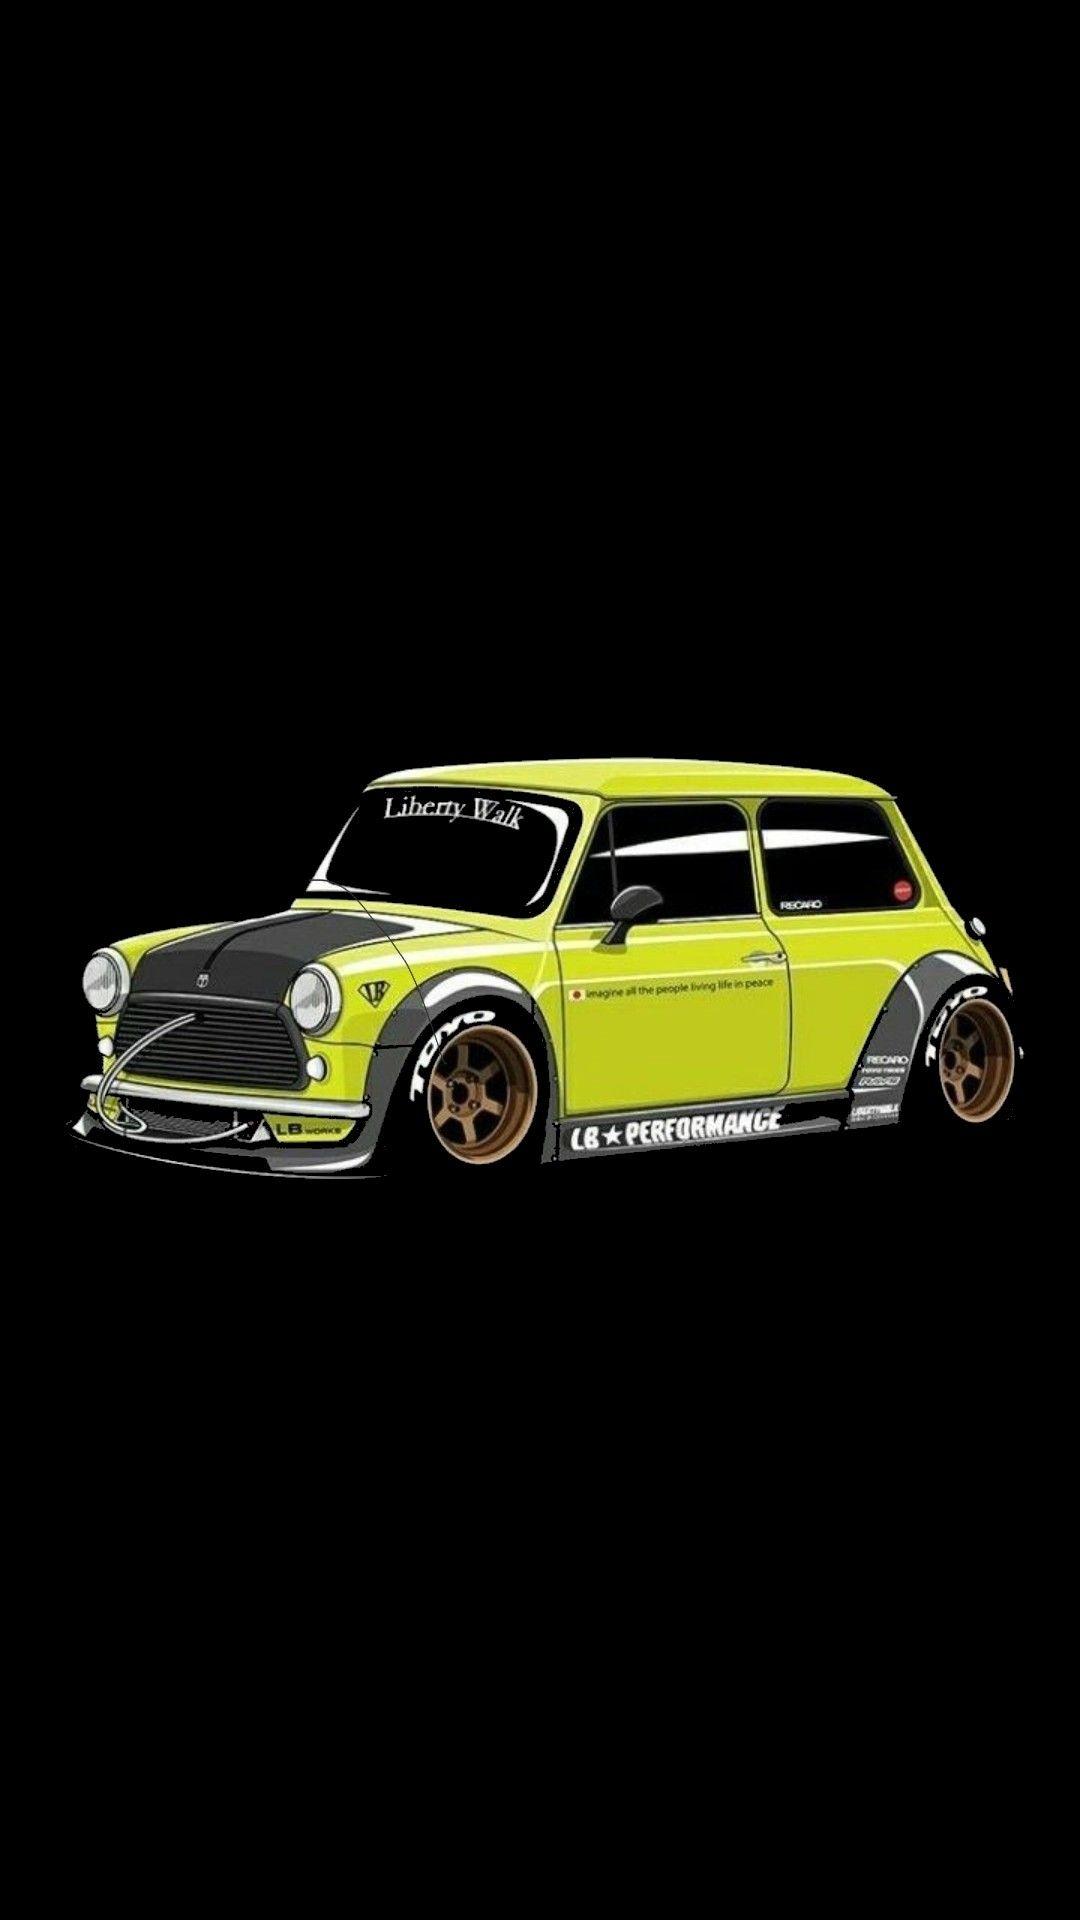 Mr Bean Mini Cooper Crazy Modified Car Iphone Wallpaper Mini Cooper Car Cartoon